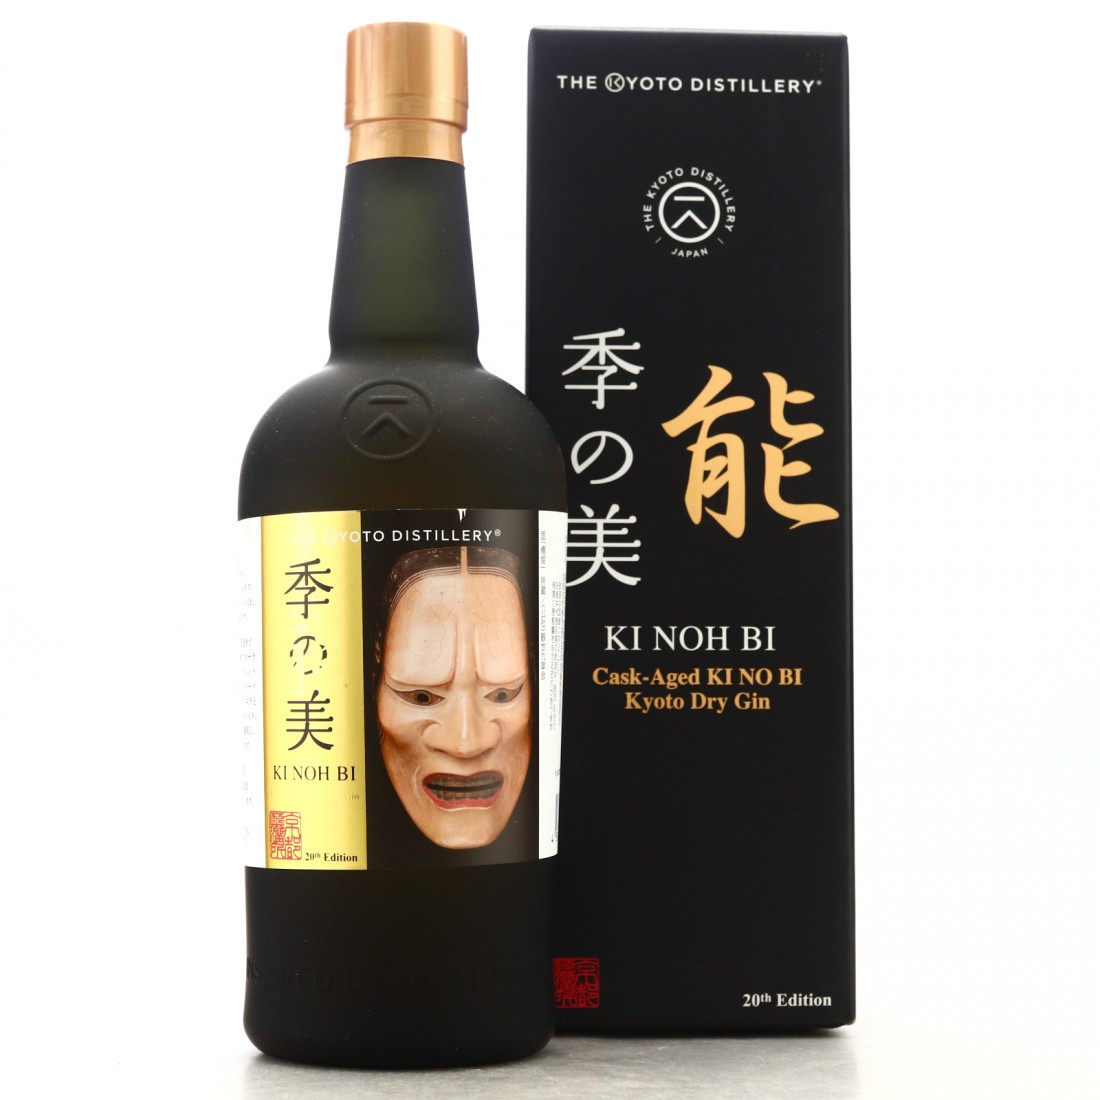 Kyoto Ki Noh Bi ex-Karuizawa Cask Dry Gin 20th Edition